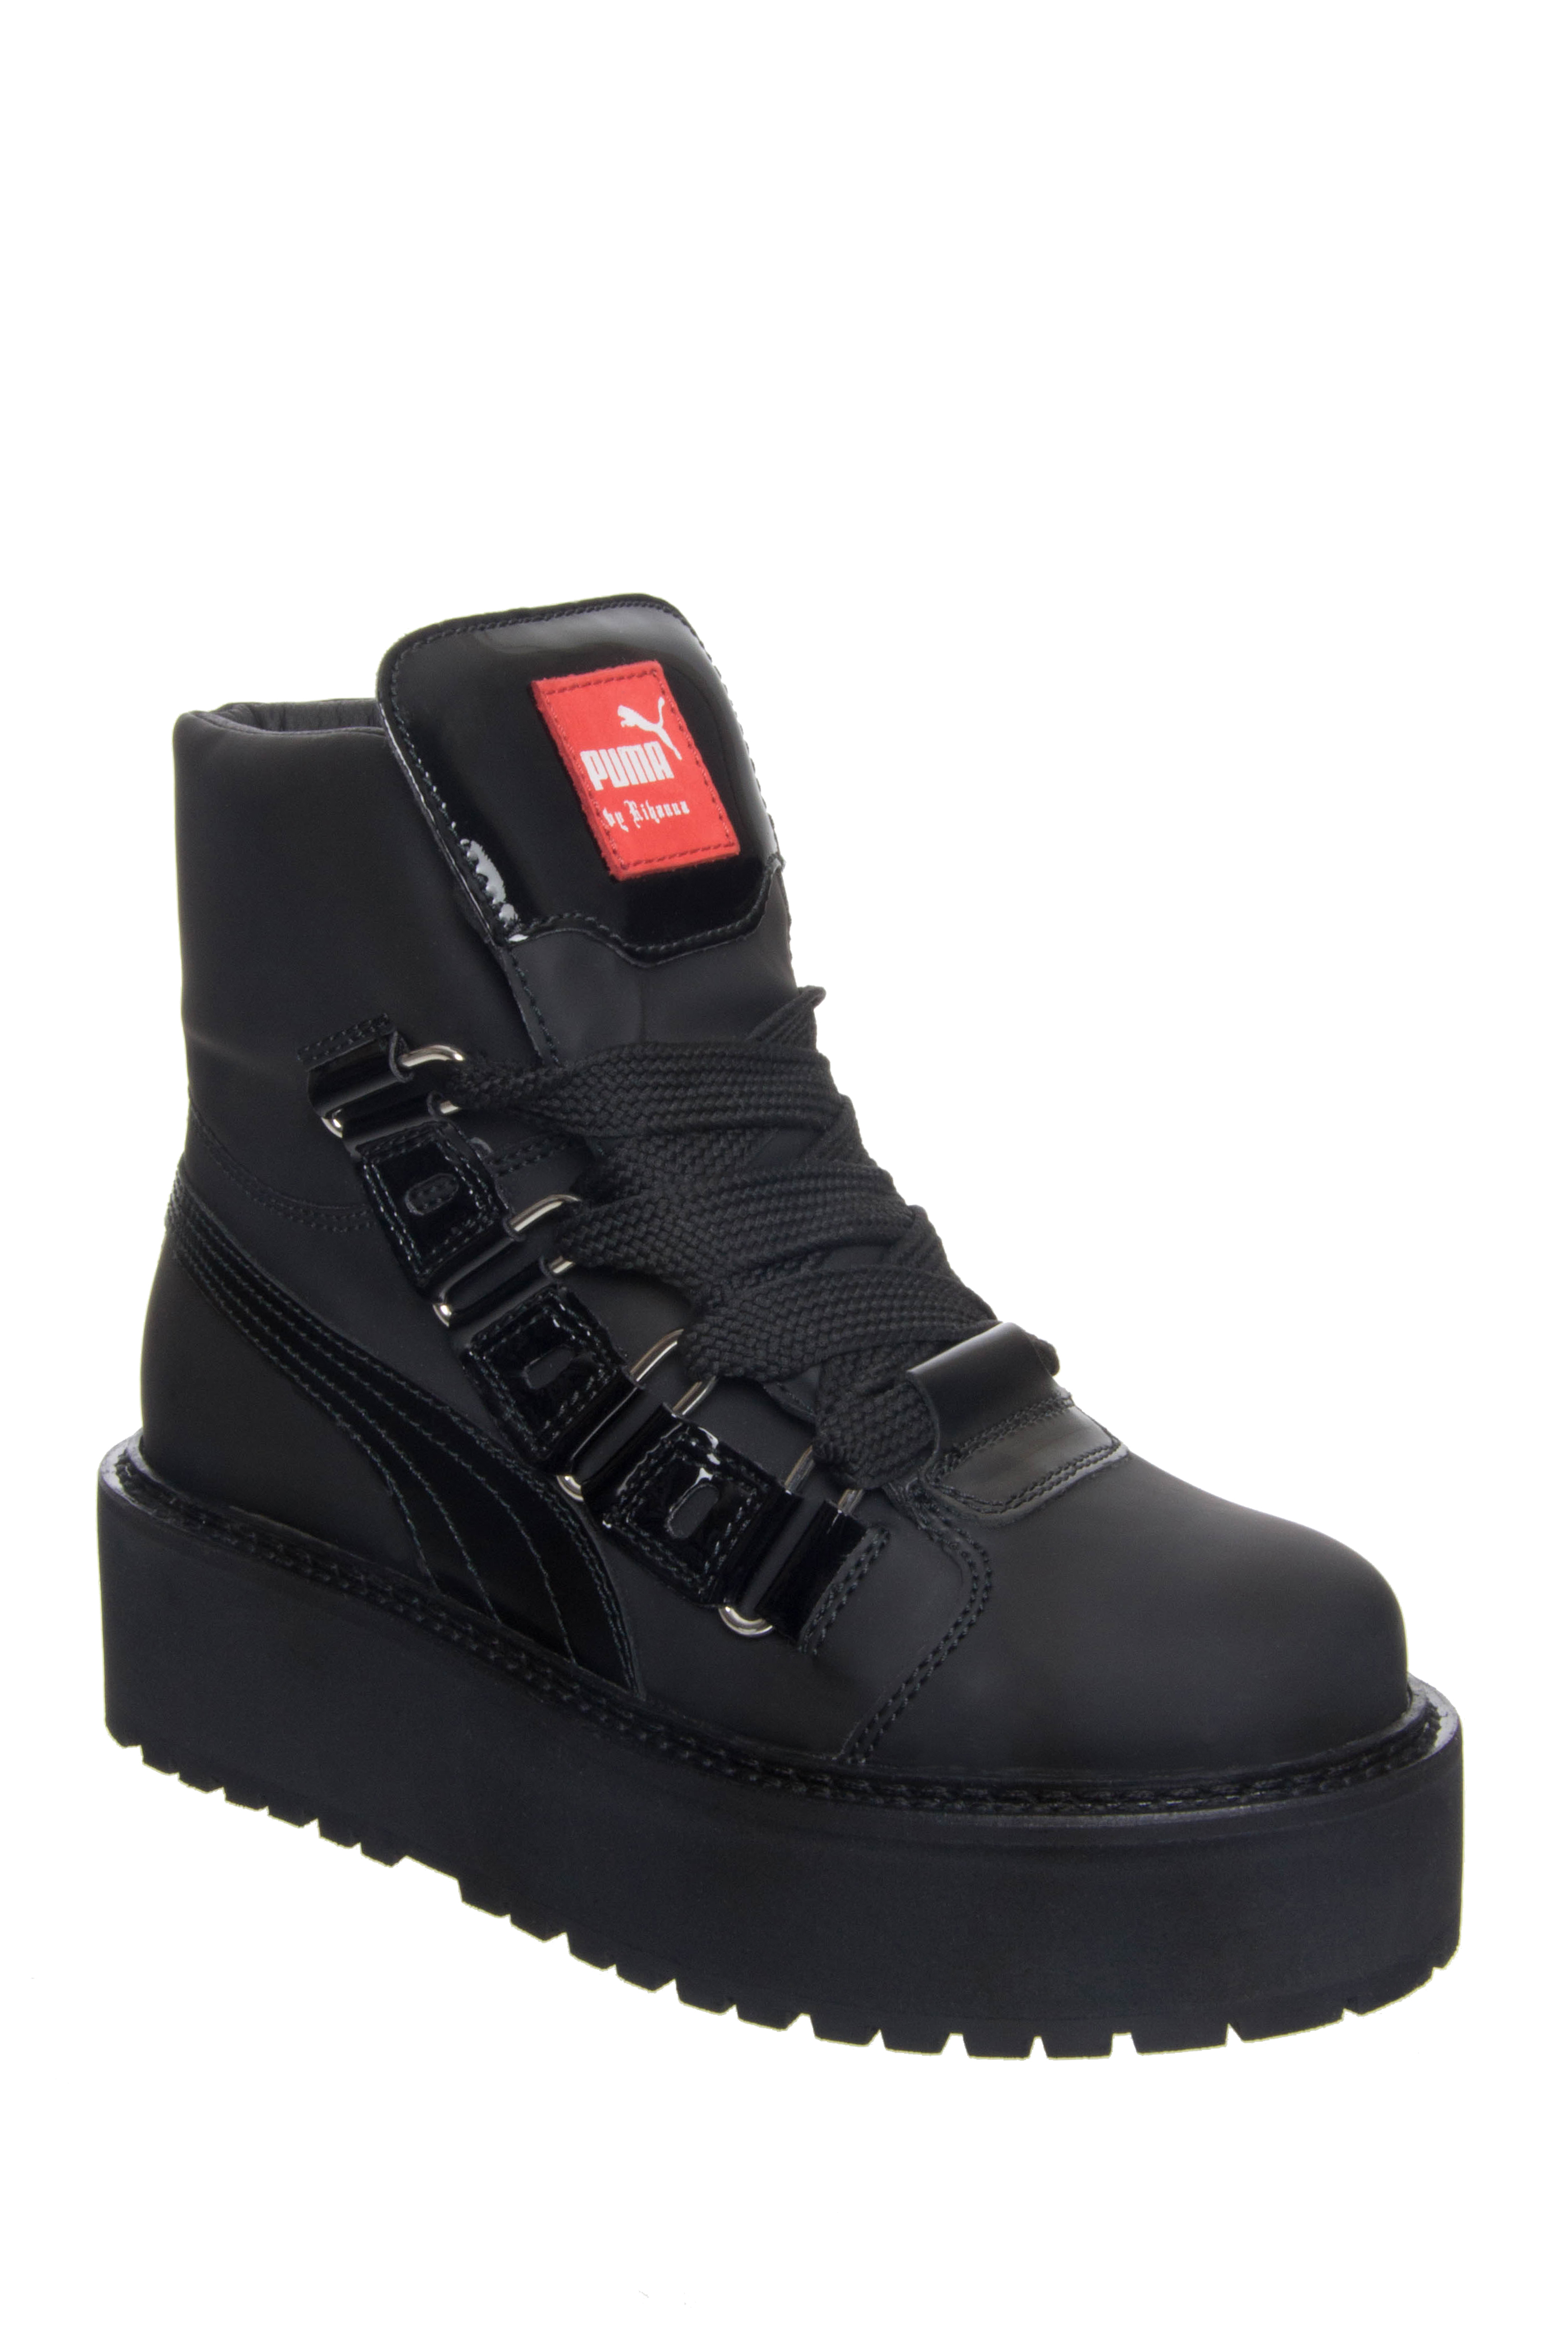 Puma Unisex Fenty x by Rihanna Platform Eyelet Sneakers Boots - Black